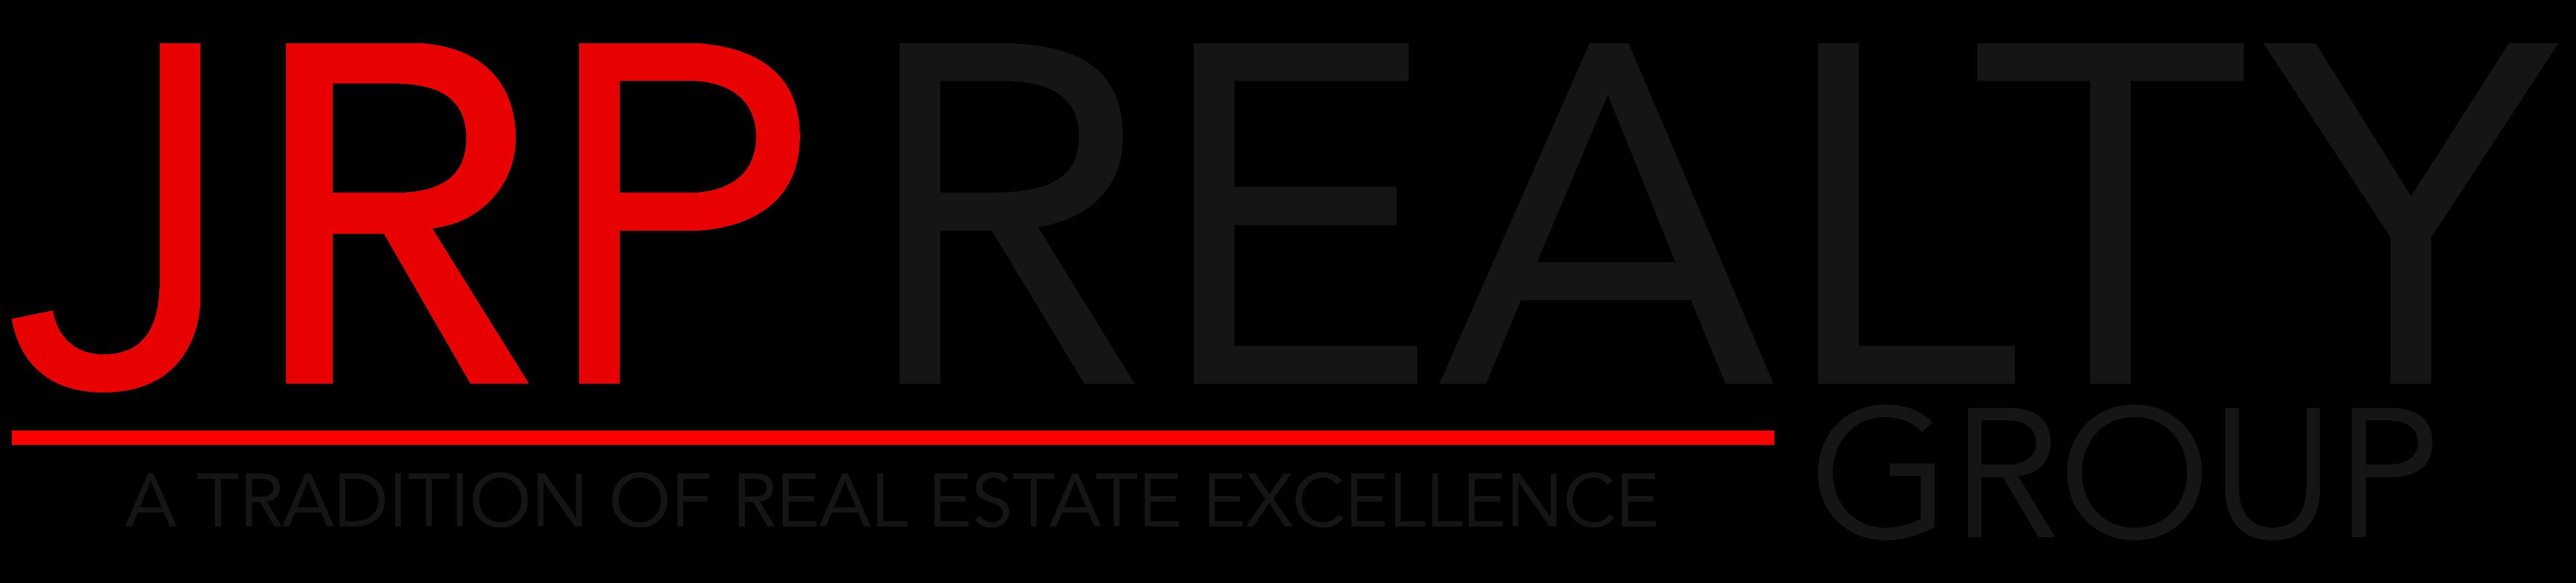 JRP Realty Group logo